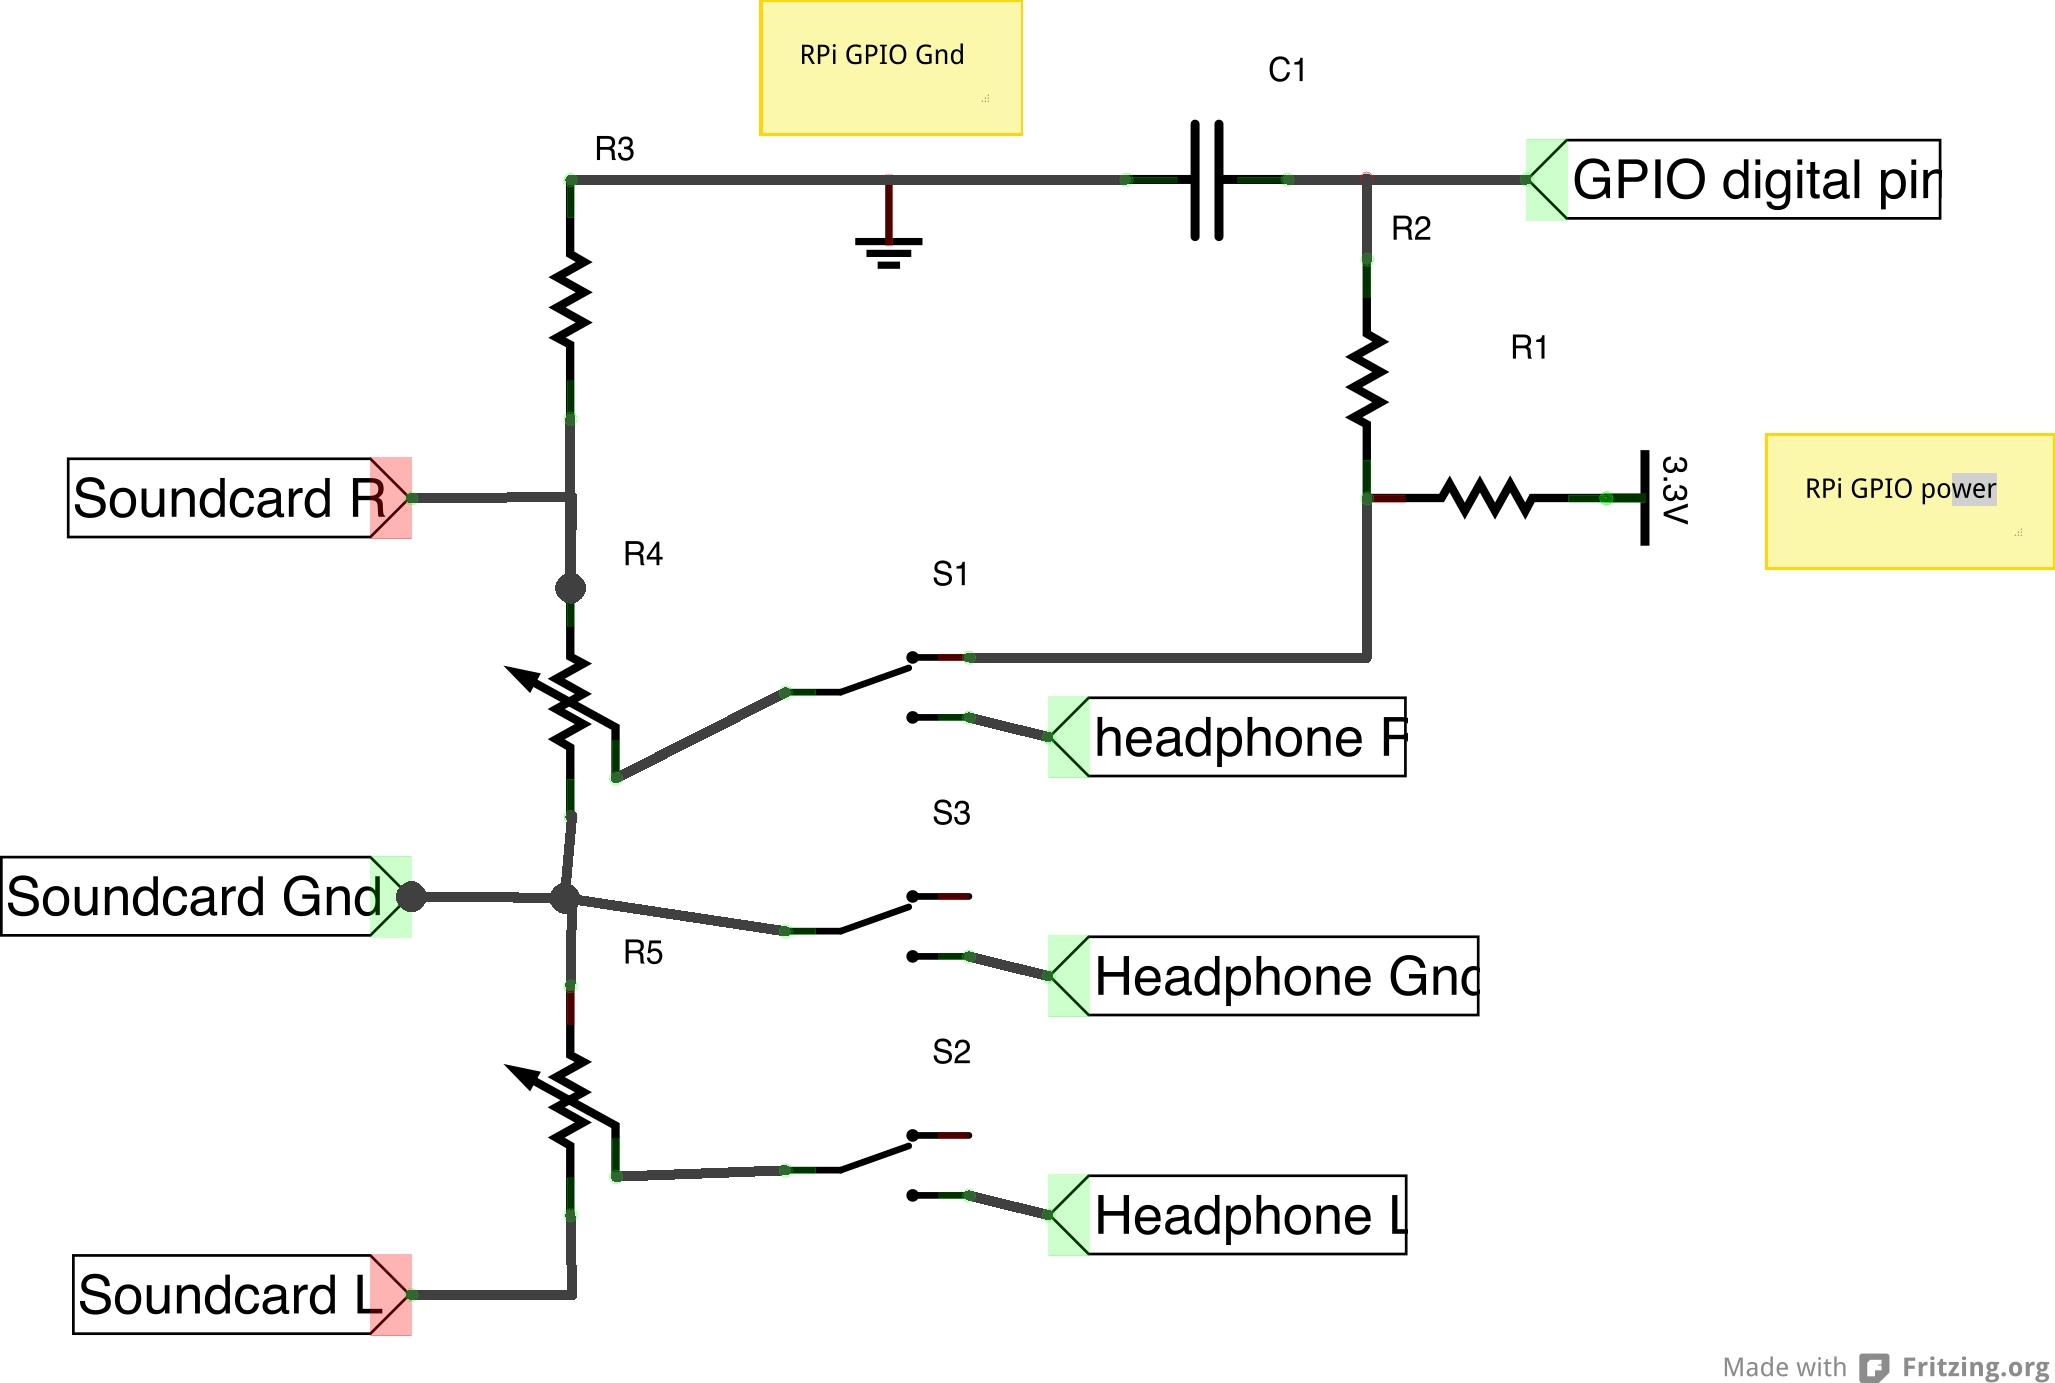 4 Audio Jack Wiring How Can I Use The Rpi Gpio To Make A Headphone Sensing